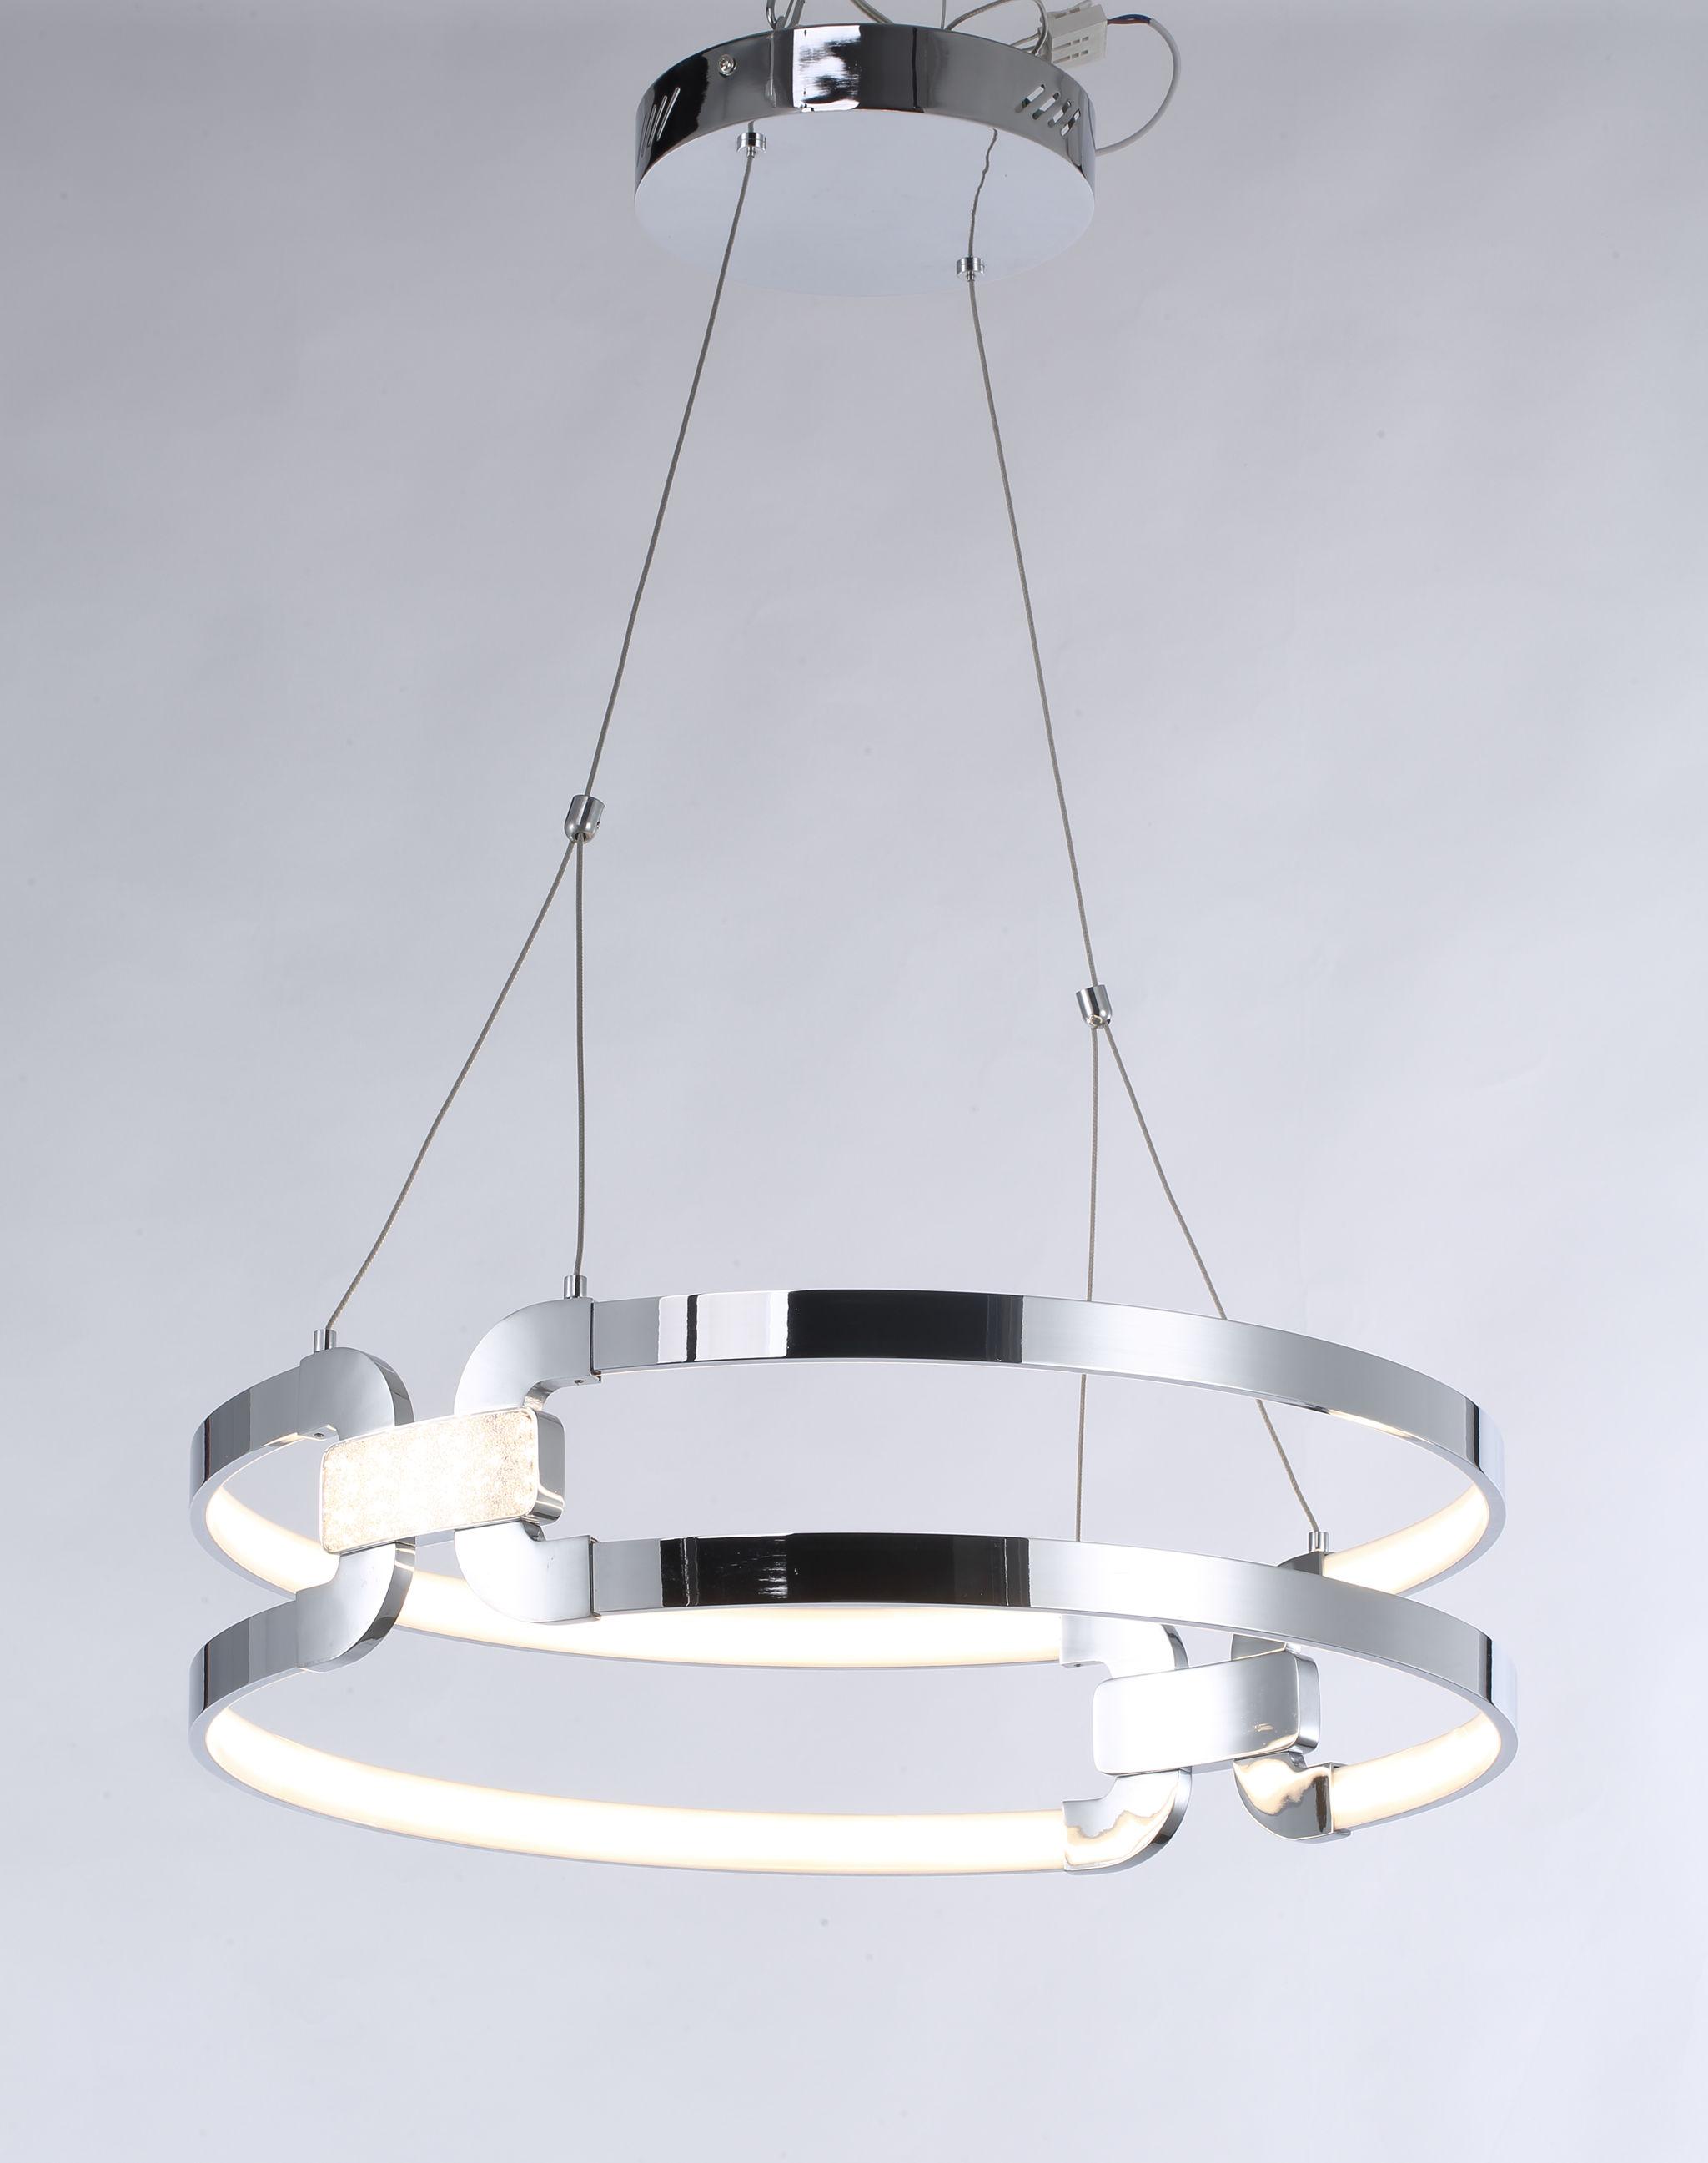 estelle rp60 c kristall chrome pendelleuchte. Black Bedroom Furniture Sets. Home Design Ideas